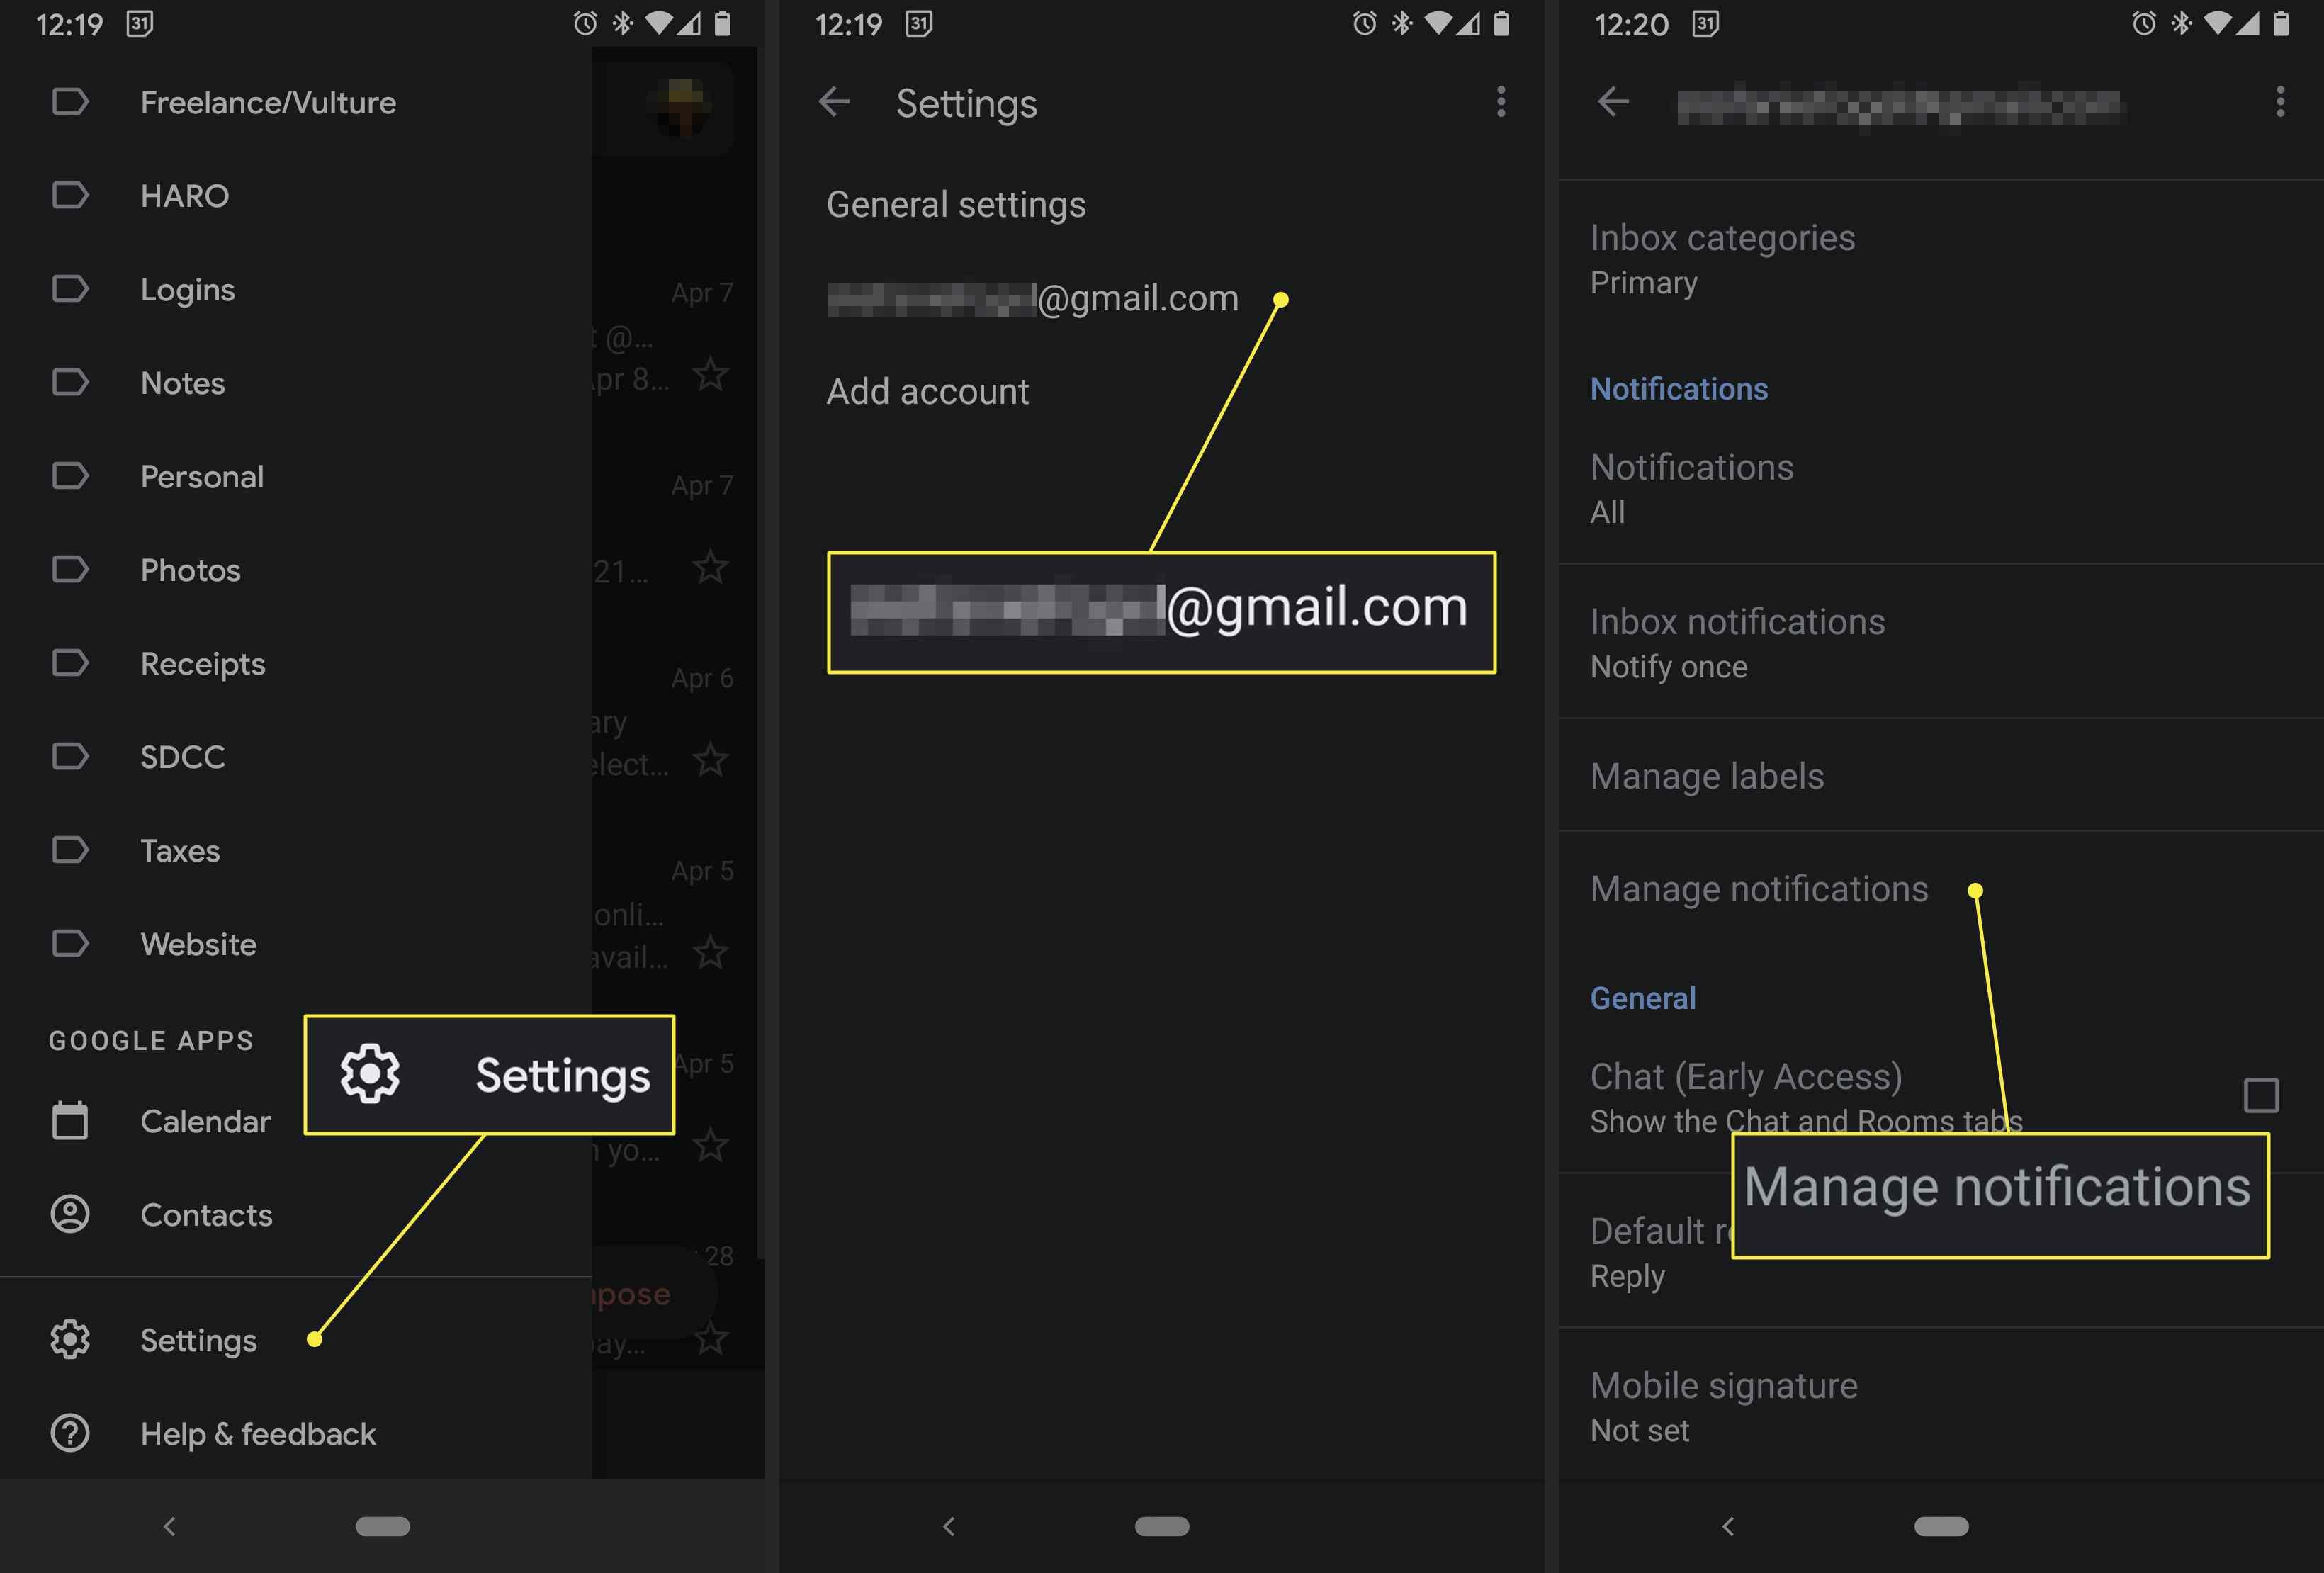 A Gmail app user accesses notifications via the settings menu